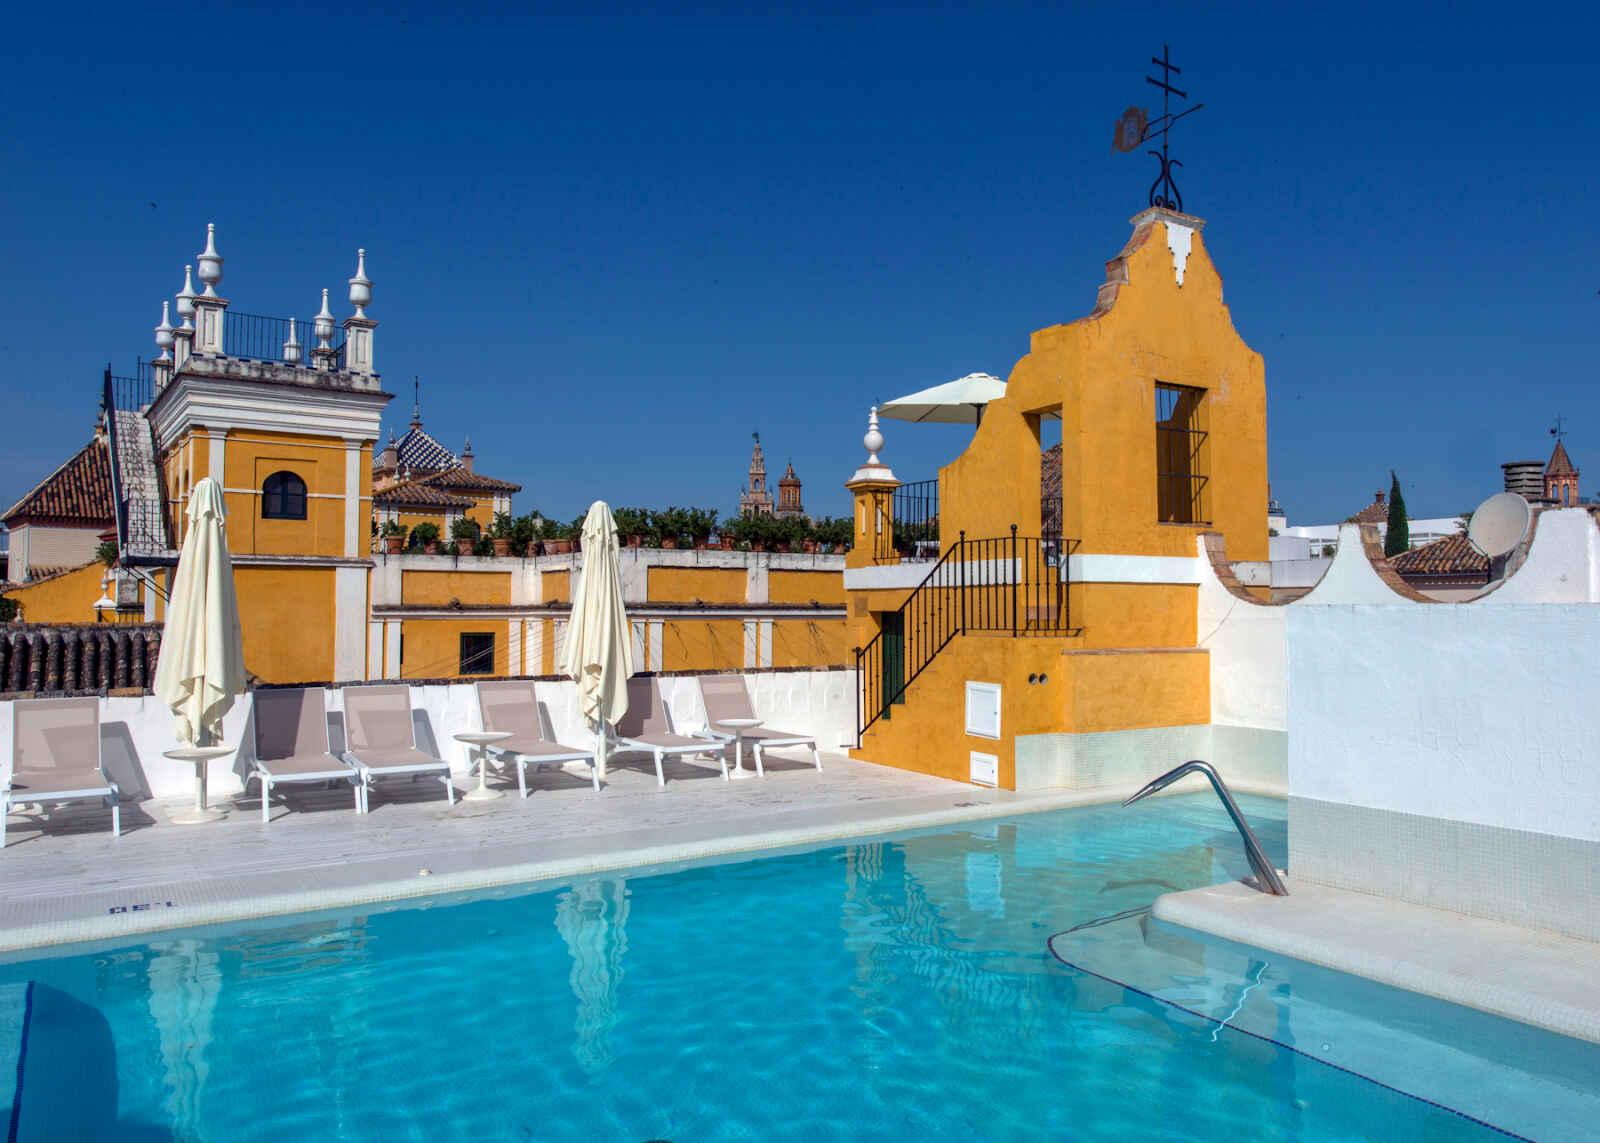 Séjour Seville - Las Casas de la Juderia - Séville - 4*